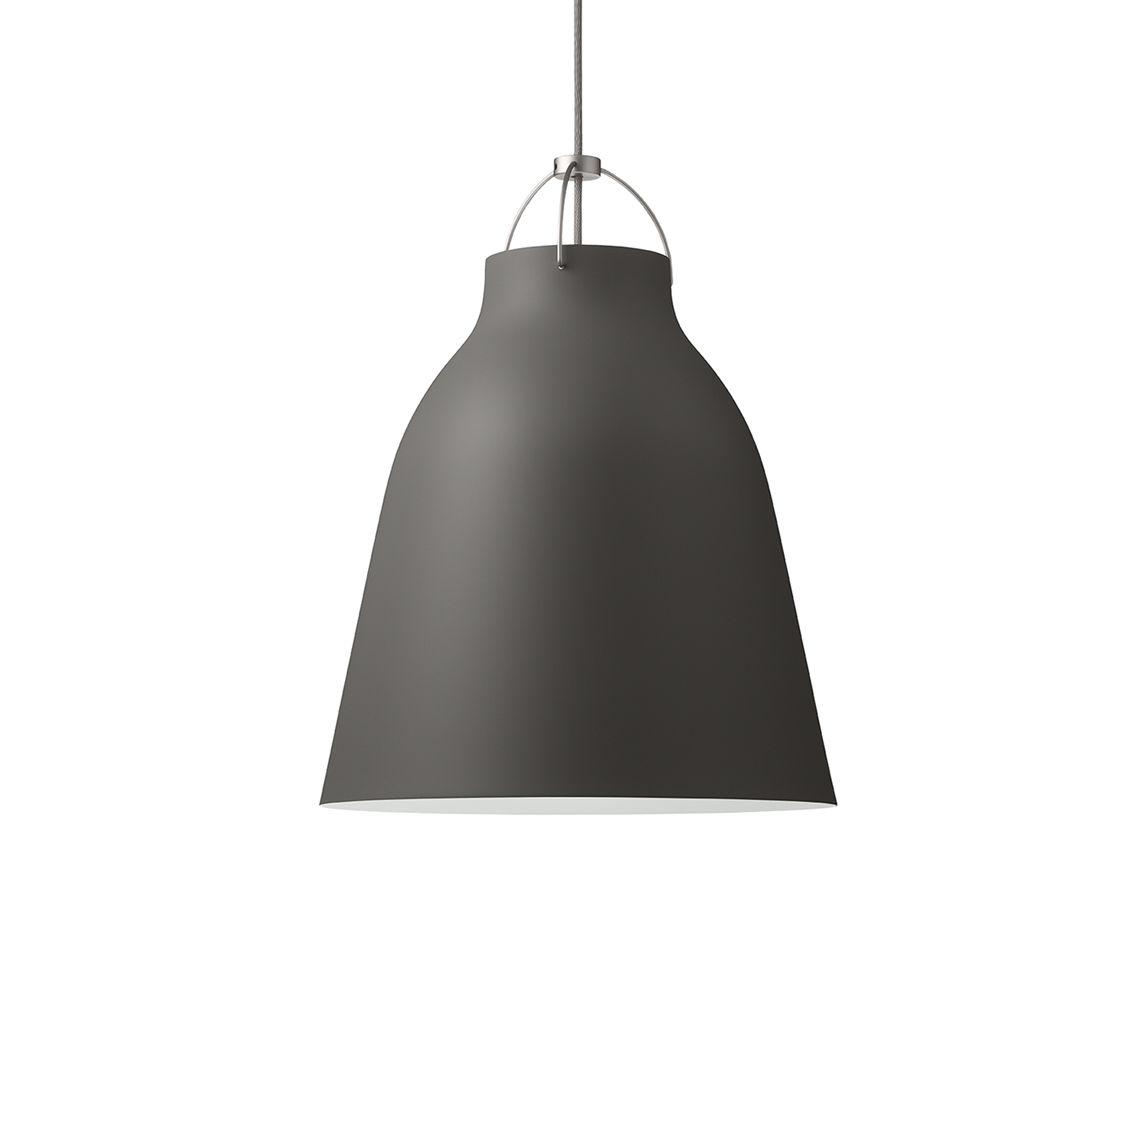 Caravaggio hanglamp Lightyears Ø16 Archipelago Stone